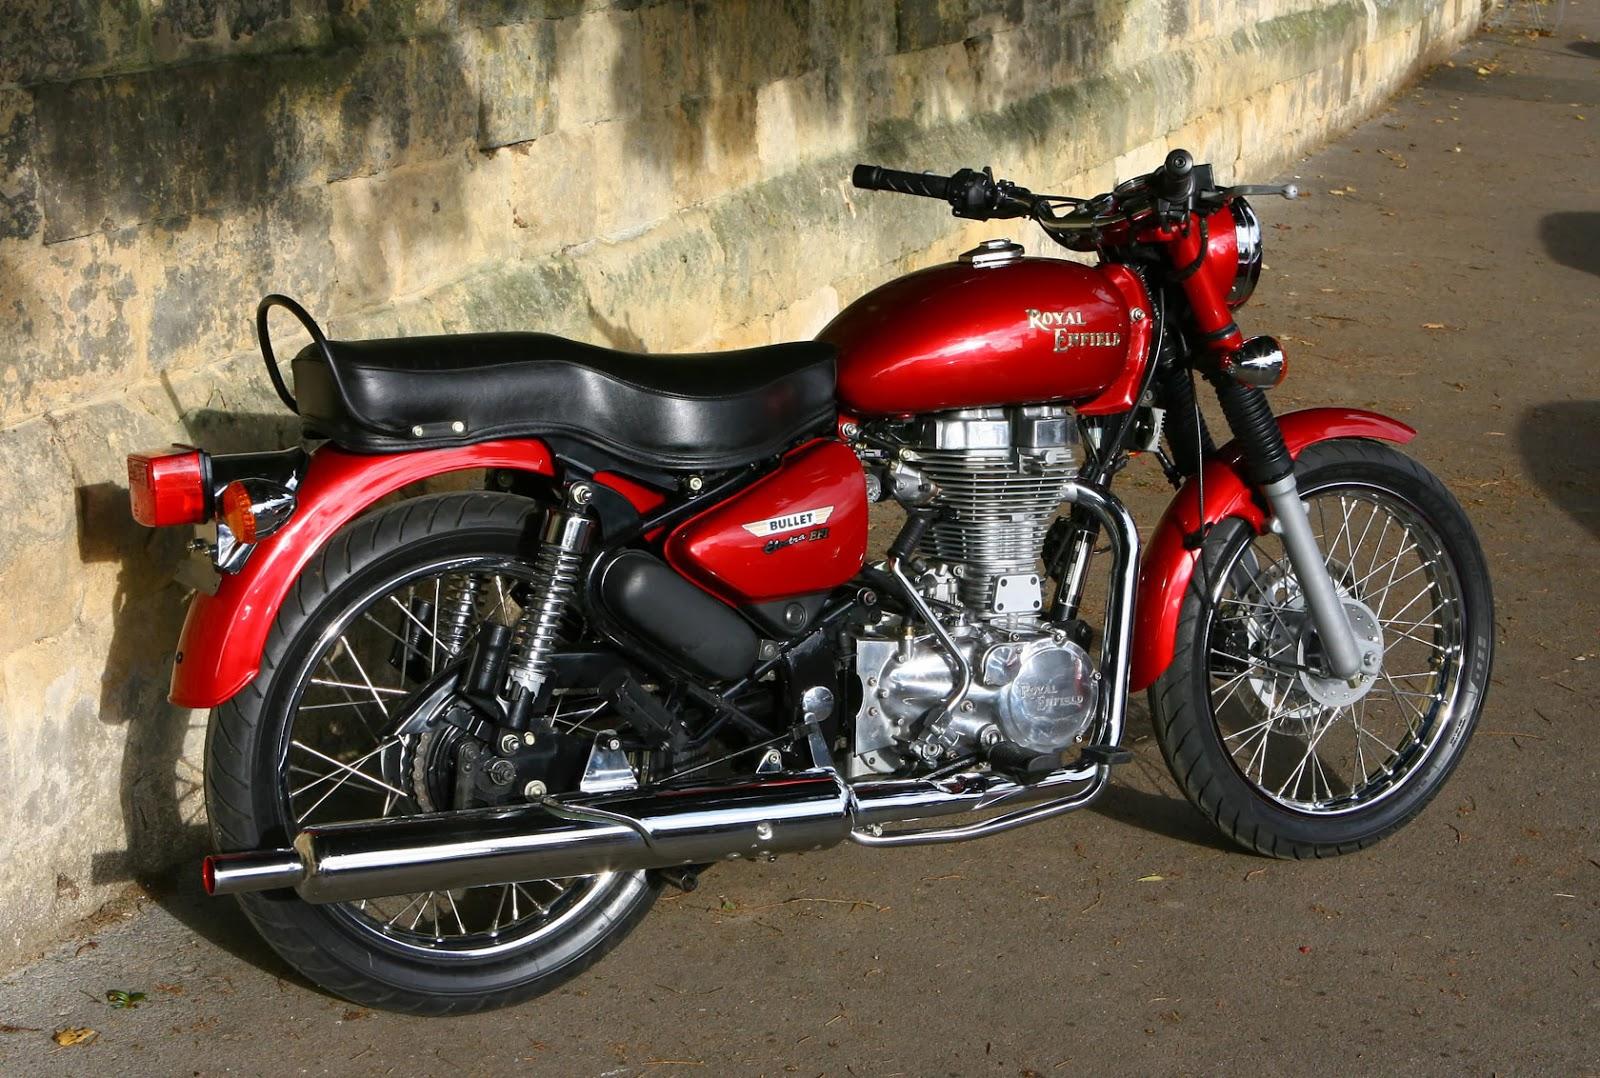 Royal Enfield Bullet Electra Efi Price In India